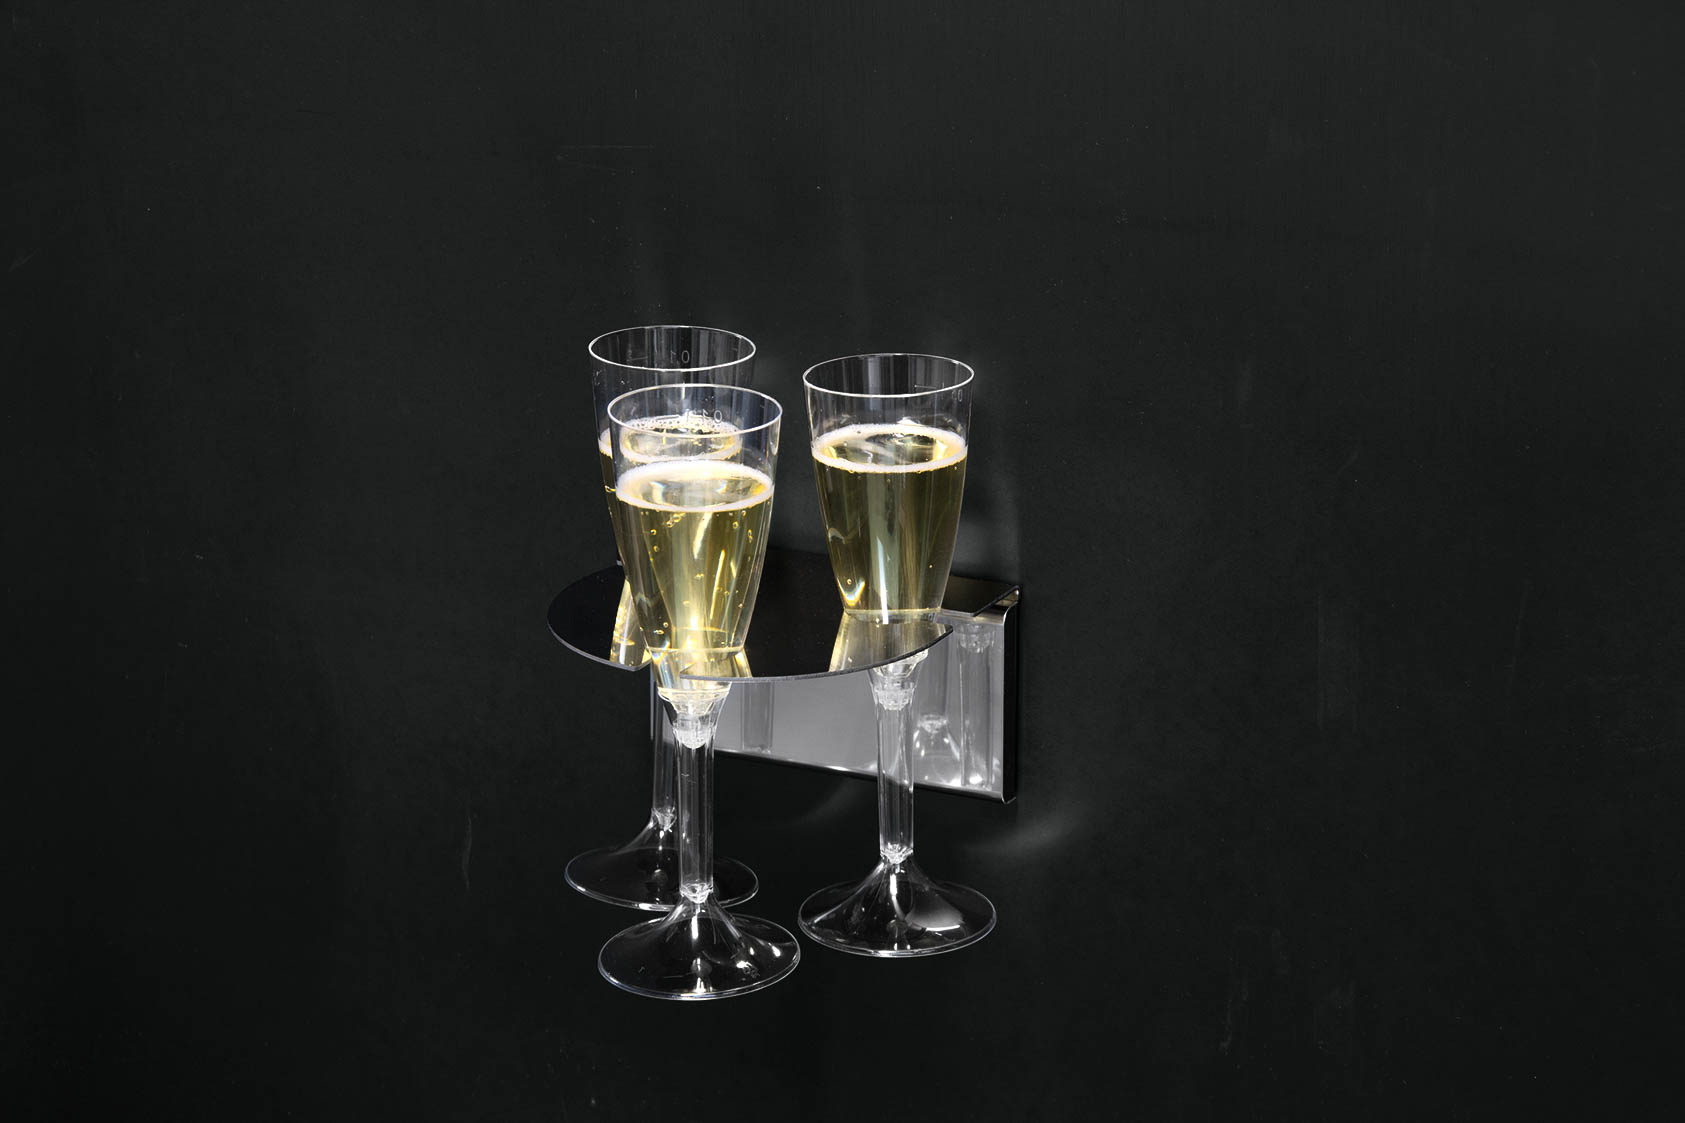 vassoio arredo design magnetico per bar e ristoranti magnetika - design ristoranti e bar - foto12